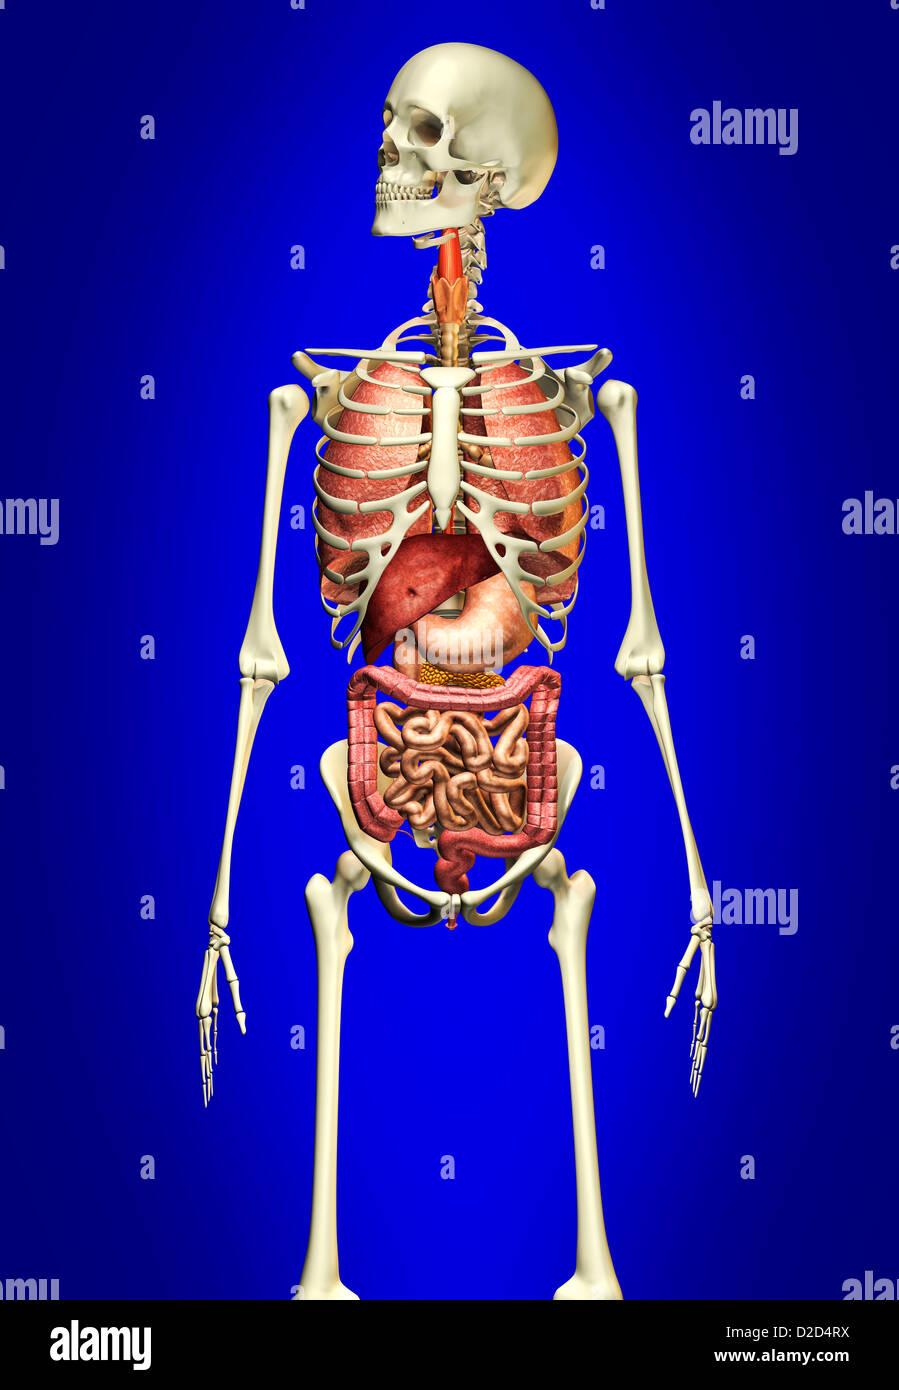 Human anatomy computer artwork - Stock Image